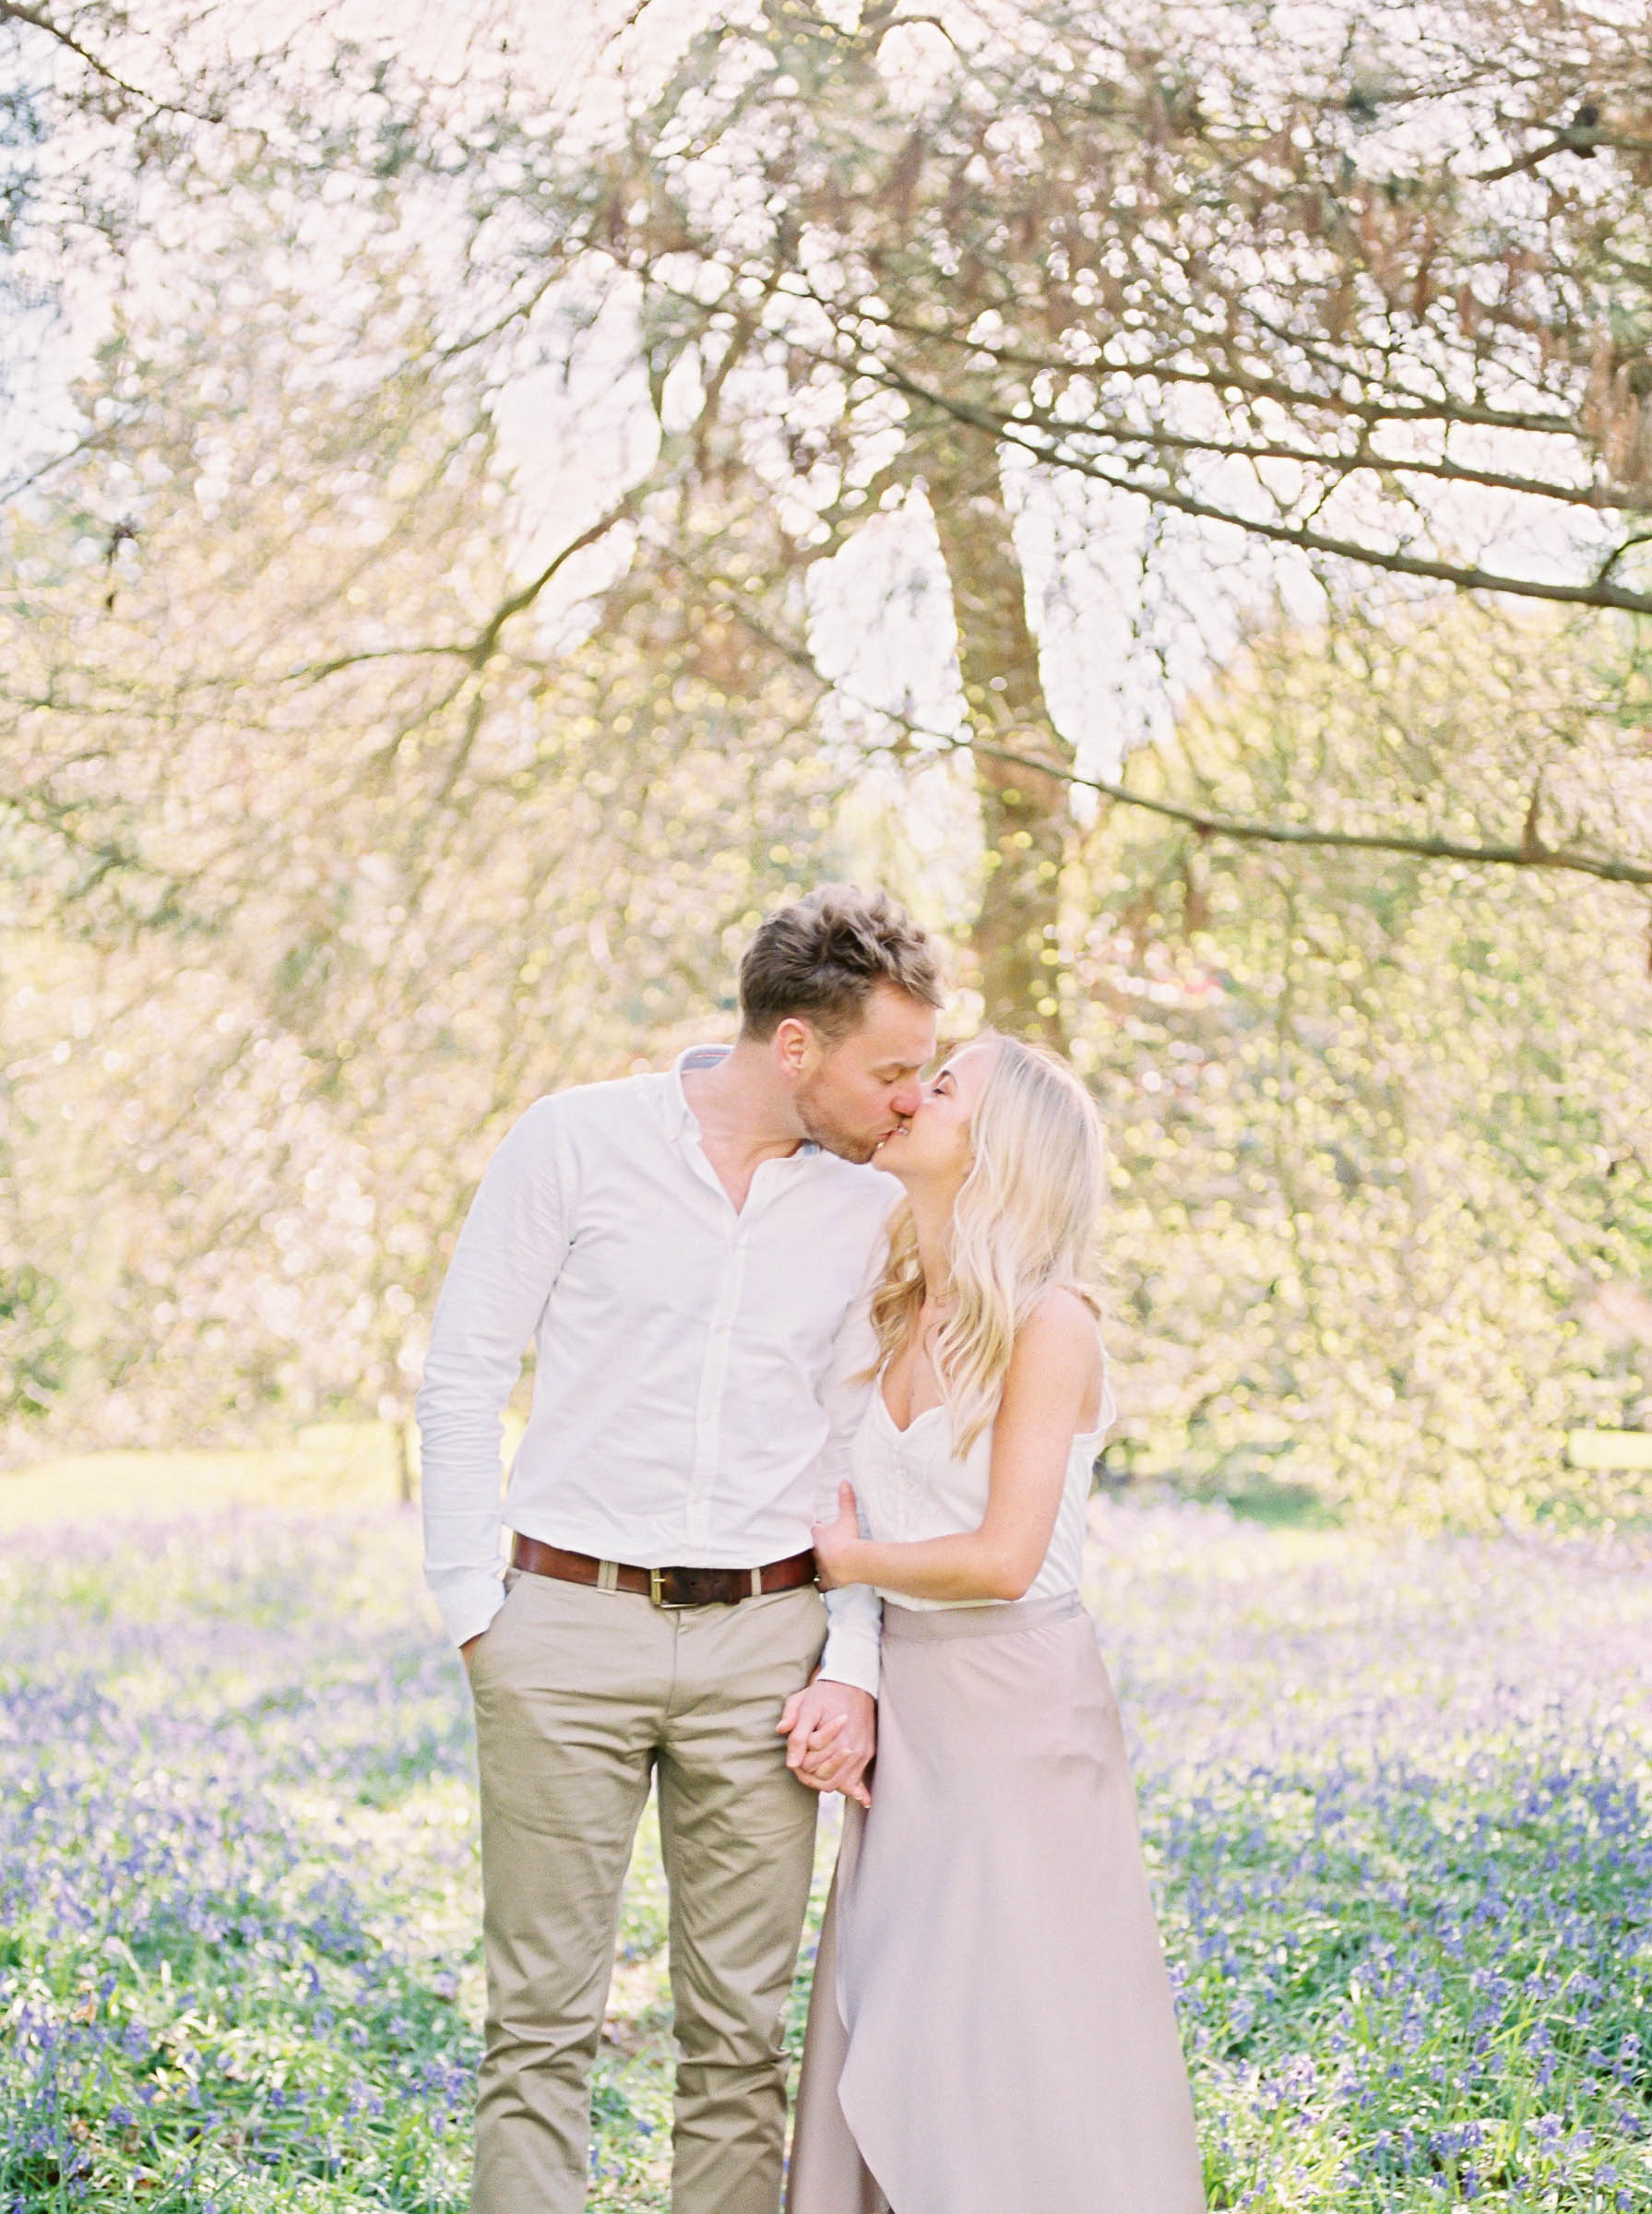 Amy O'Boyle Photography- Destination & UK Fine Art Film Wedding Photographer- Sheffield Park Garden National Trust Spring Engagement Shoot-12.jpg